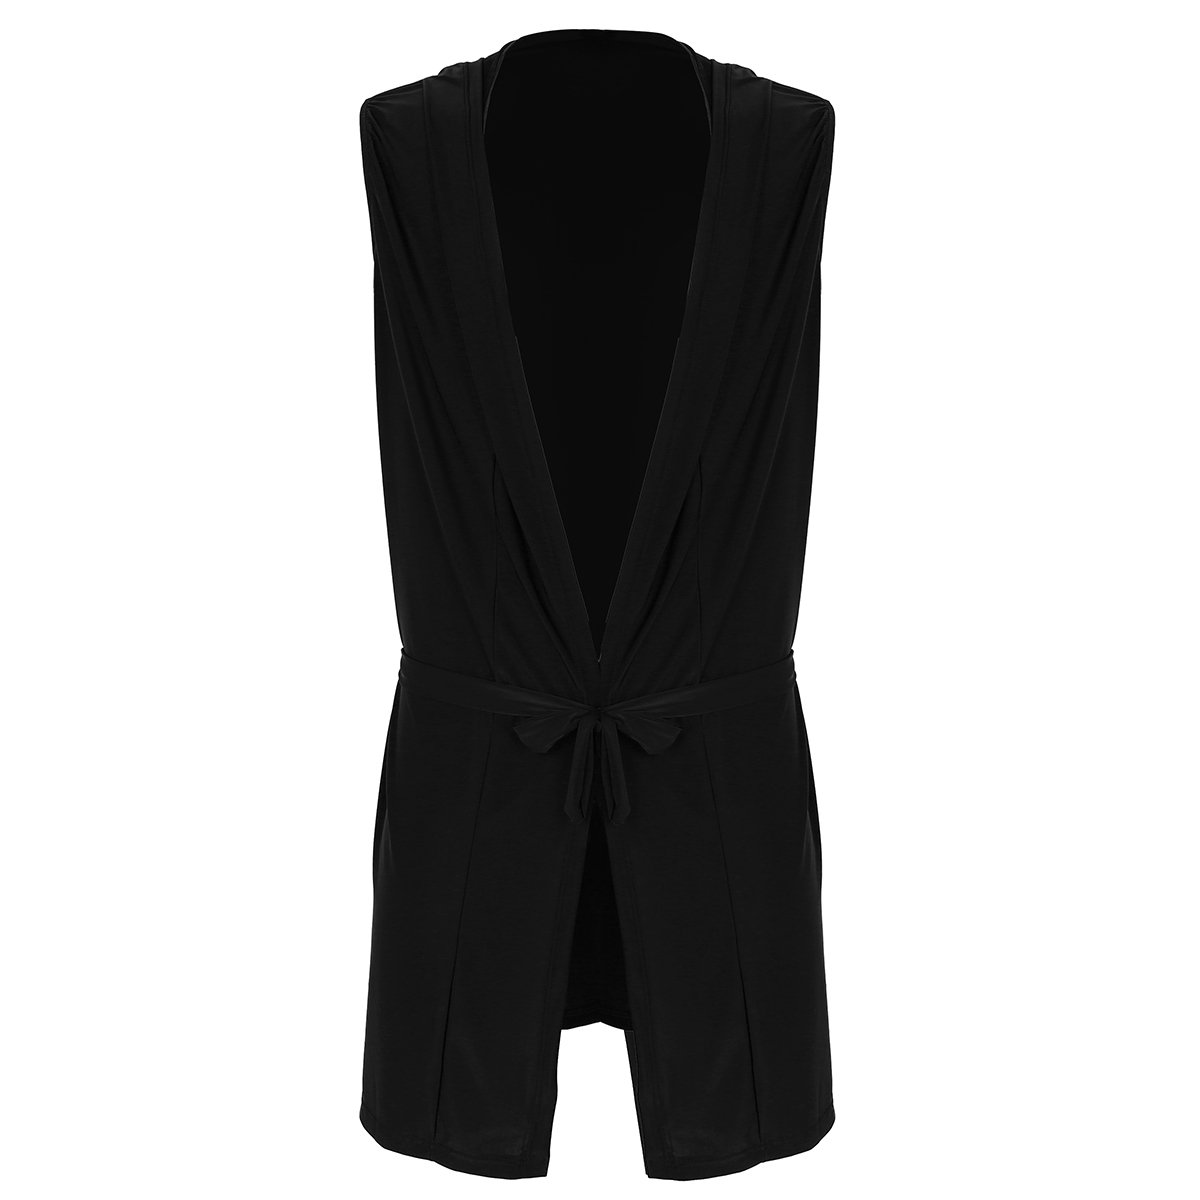 YiZYiF Men's Kimono Robe Sleeveless Hooded Sleepwear Pajamas with Waist Belt Black Medium